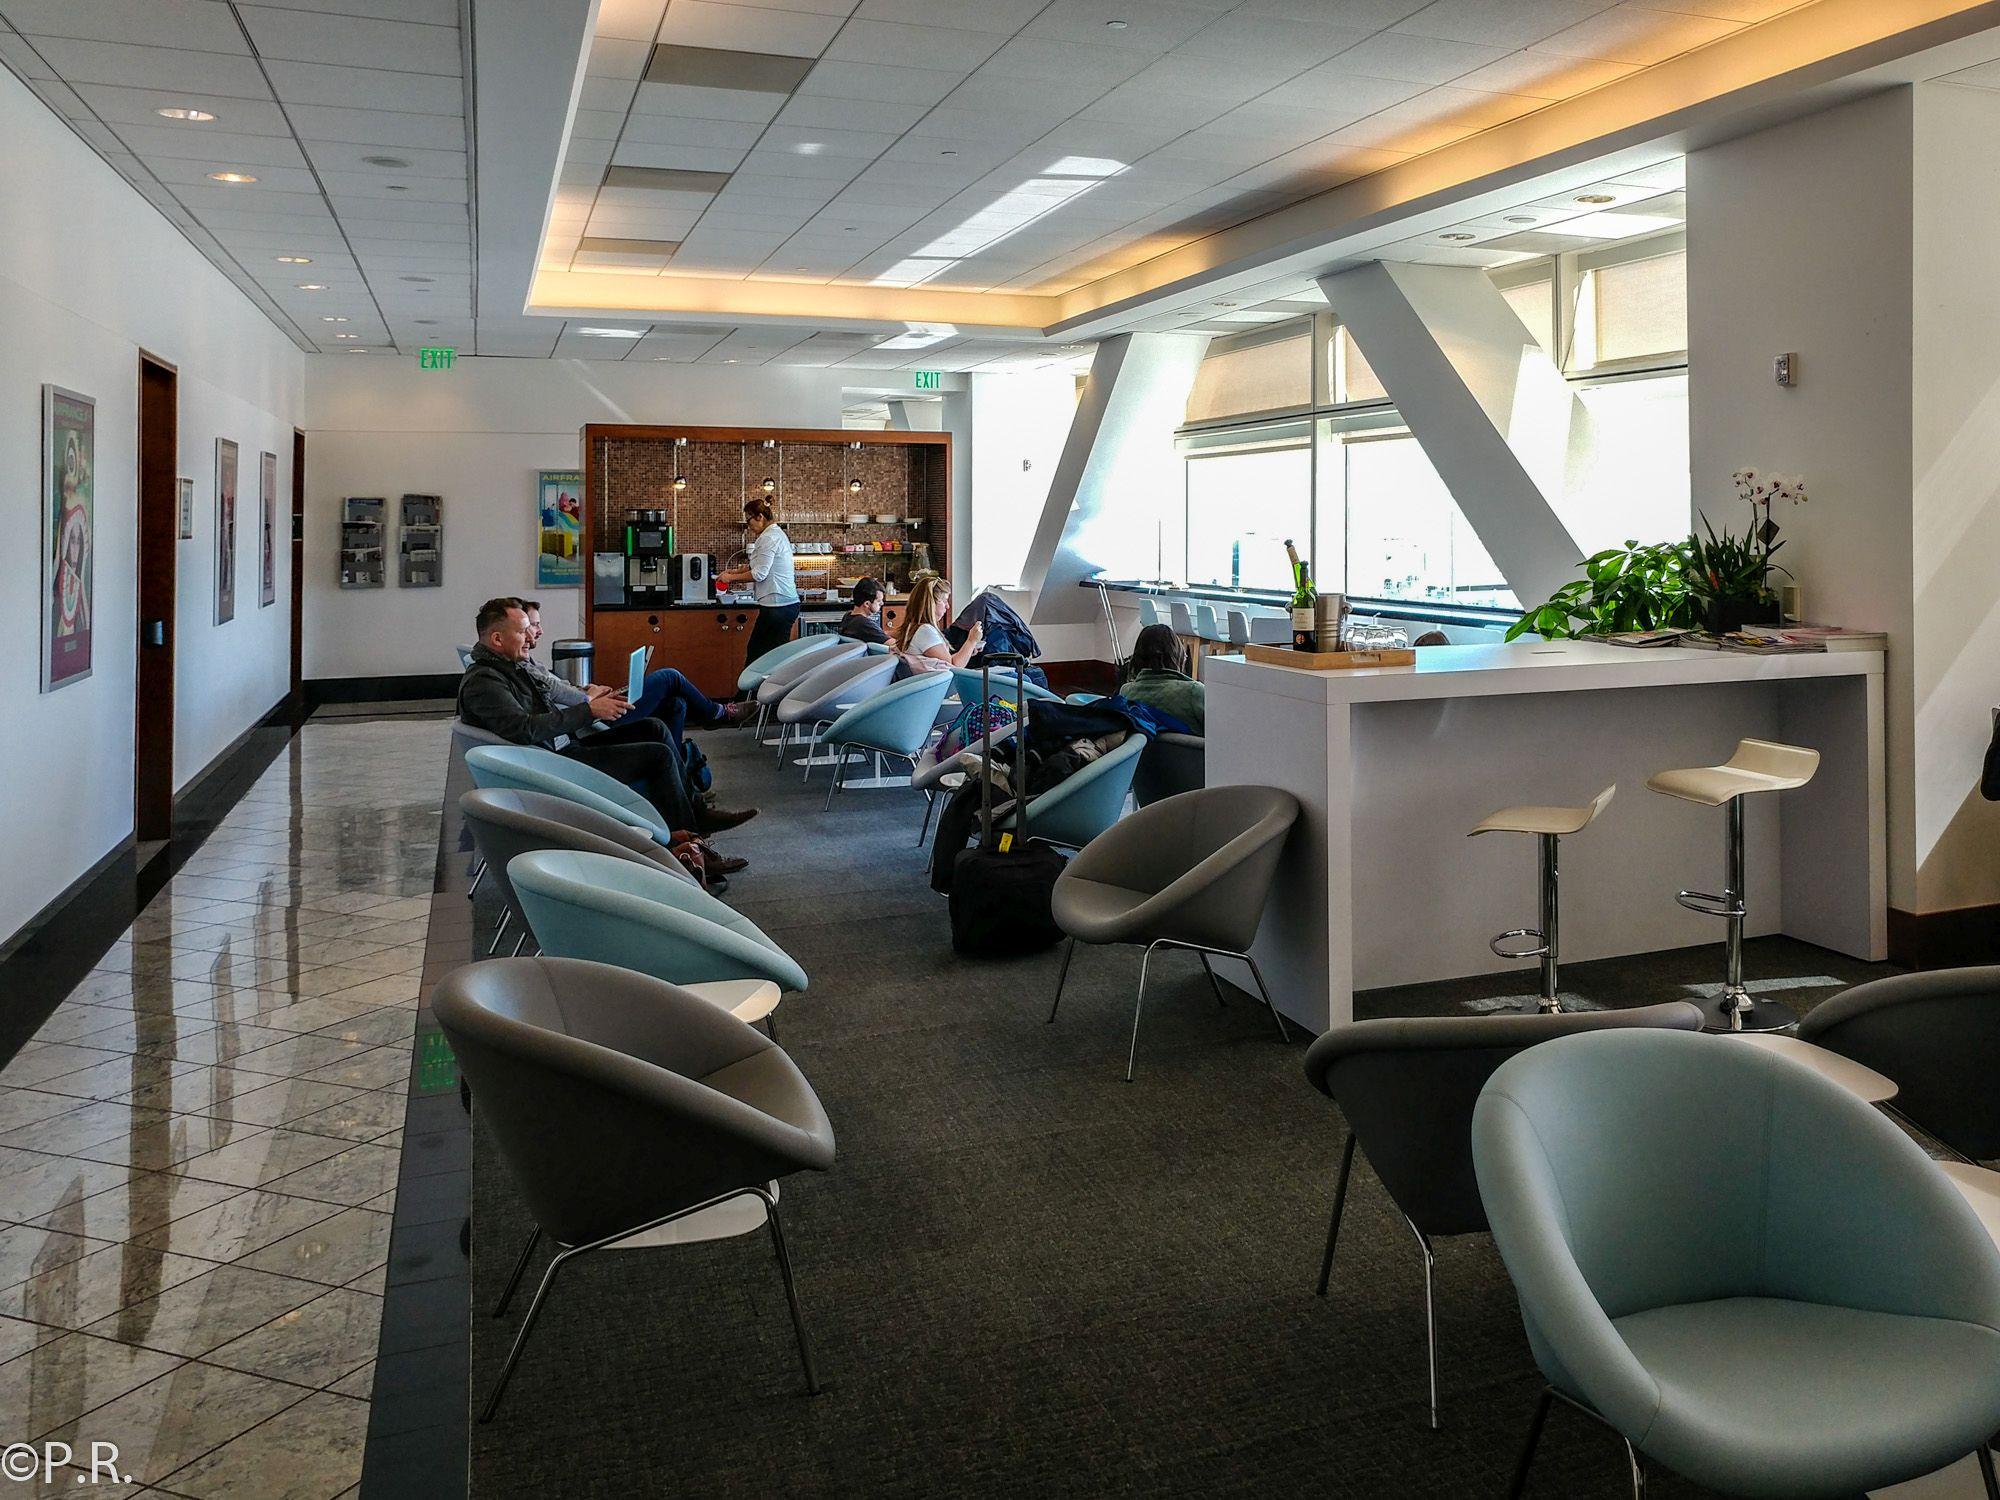 AirFrance / KLM Lounge San Francisco International (SFO) Terminal A